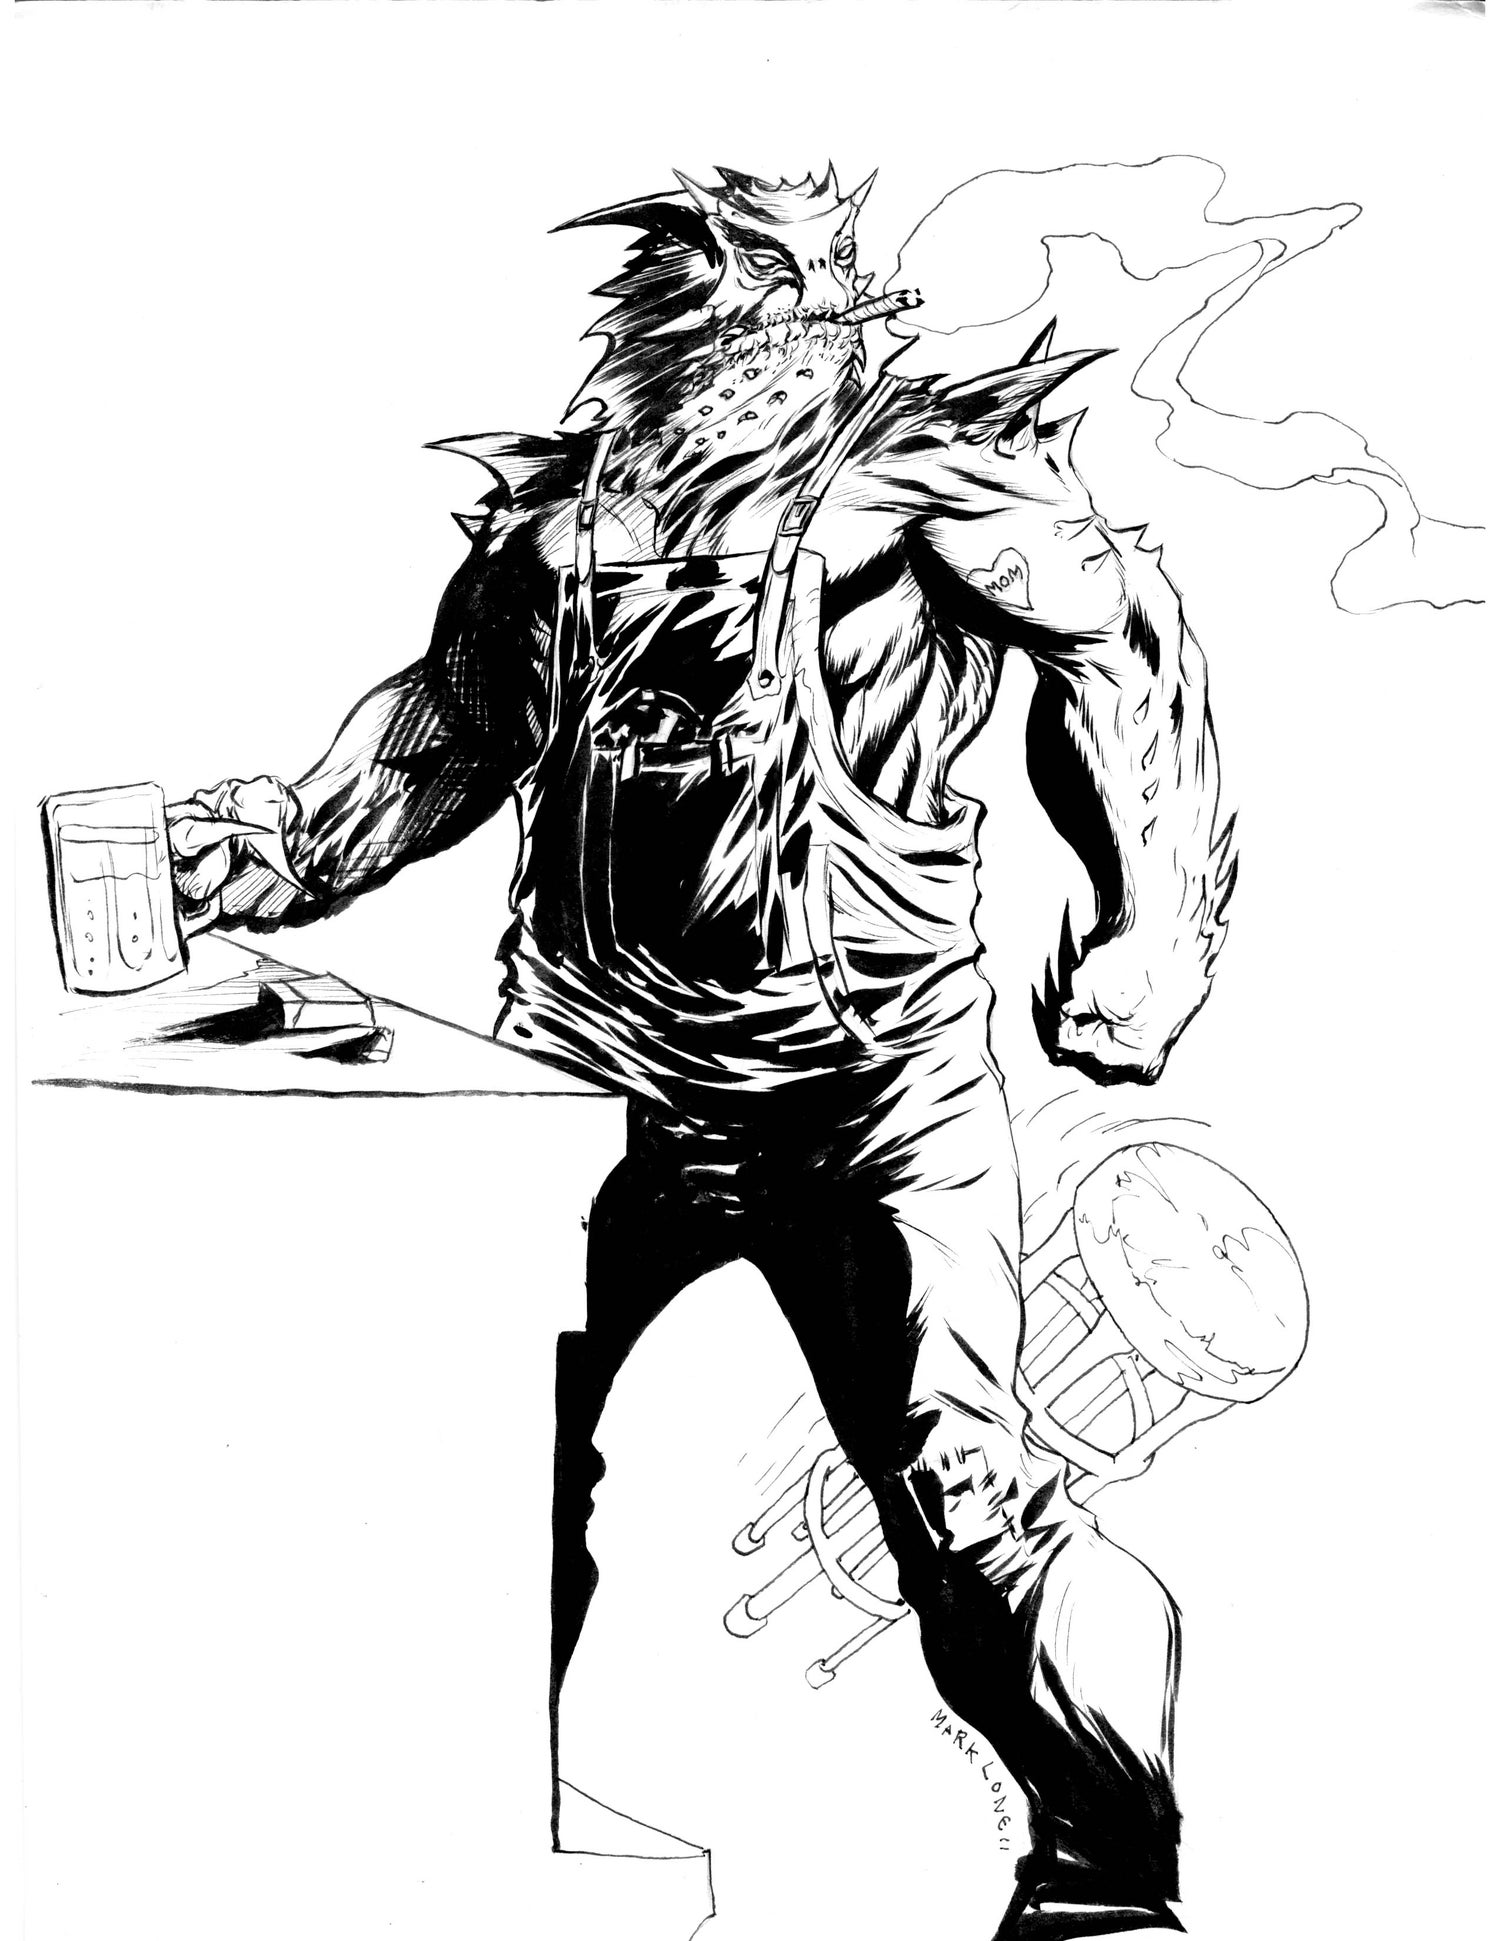 Image of Lizard Jenkins character design sheet